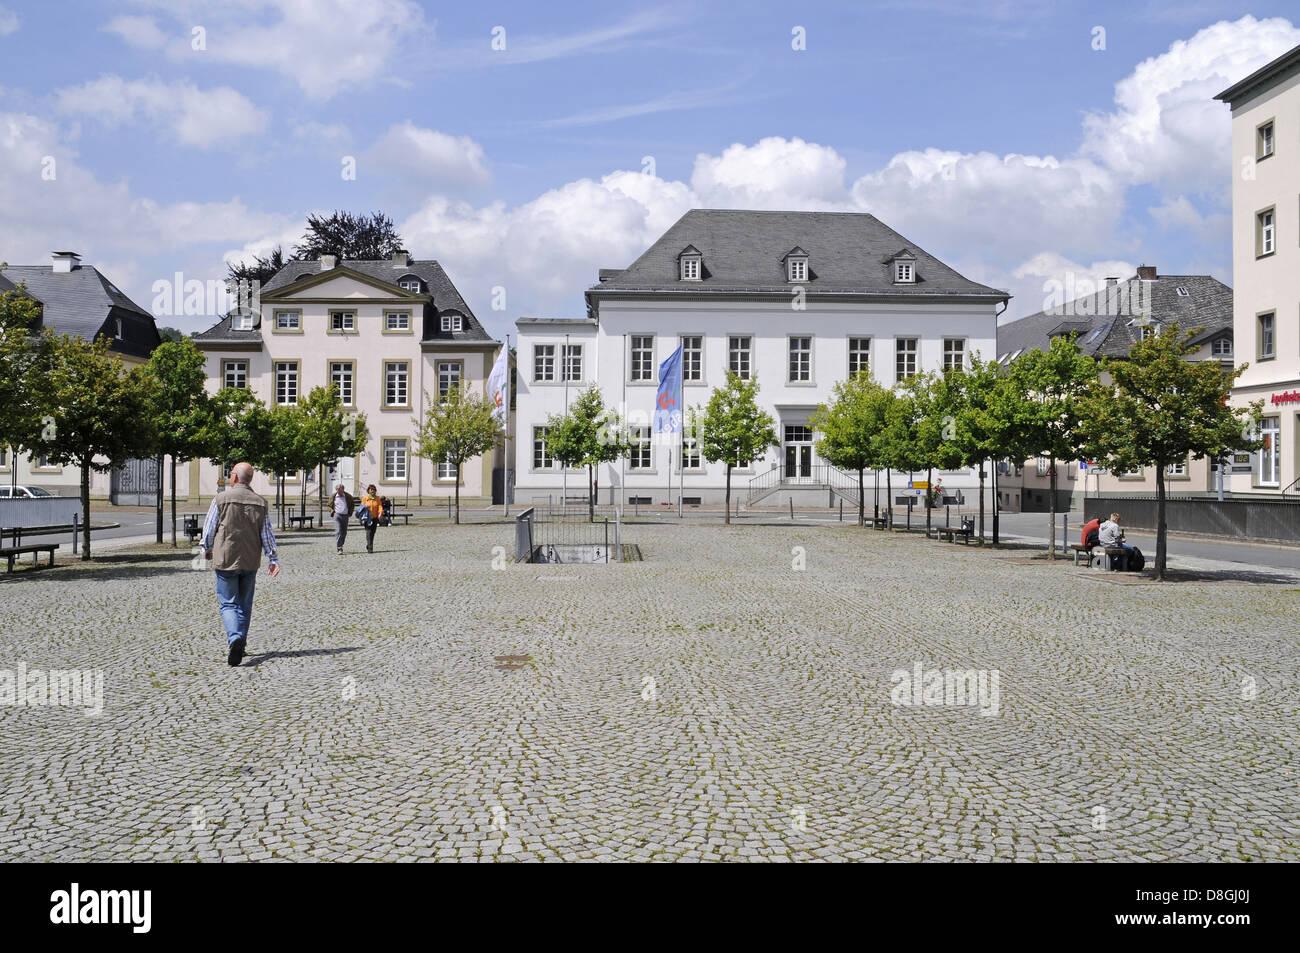 classical Neumarkt - Stock Image